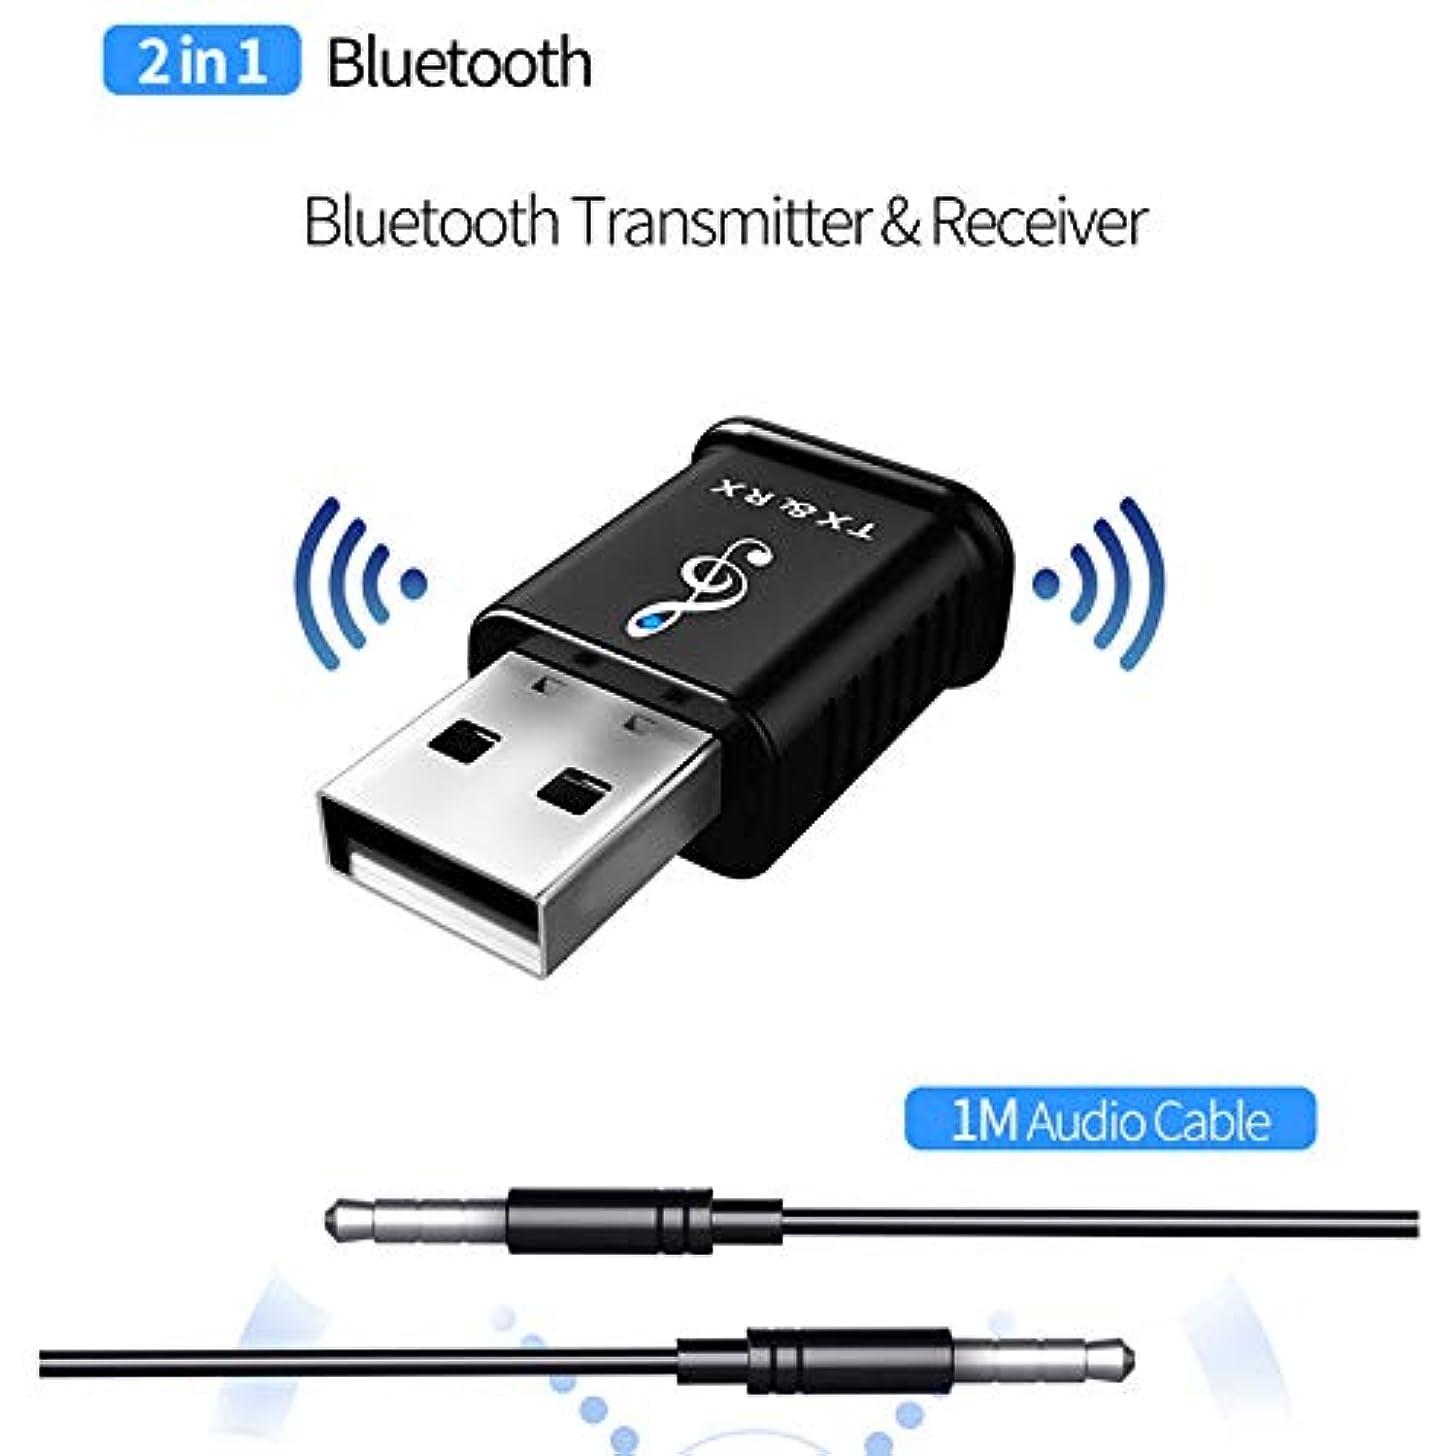 Ocamo Wireless Receiver & Transmitter, USB Receiver 5.0 Audio Transmitter Adapter for TV/PC Headphone Speaker